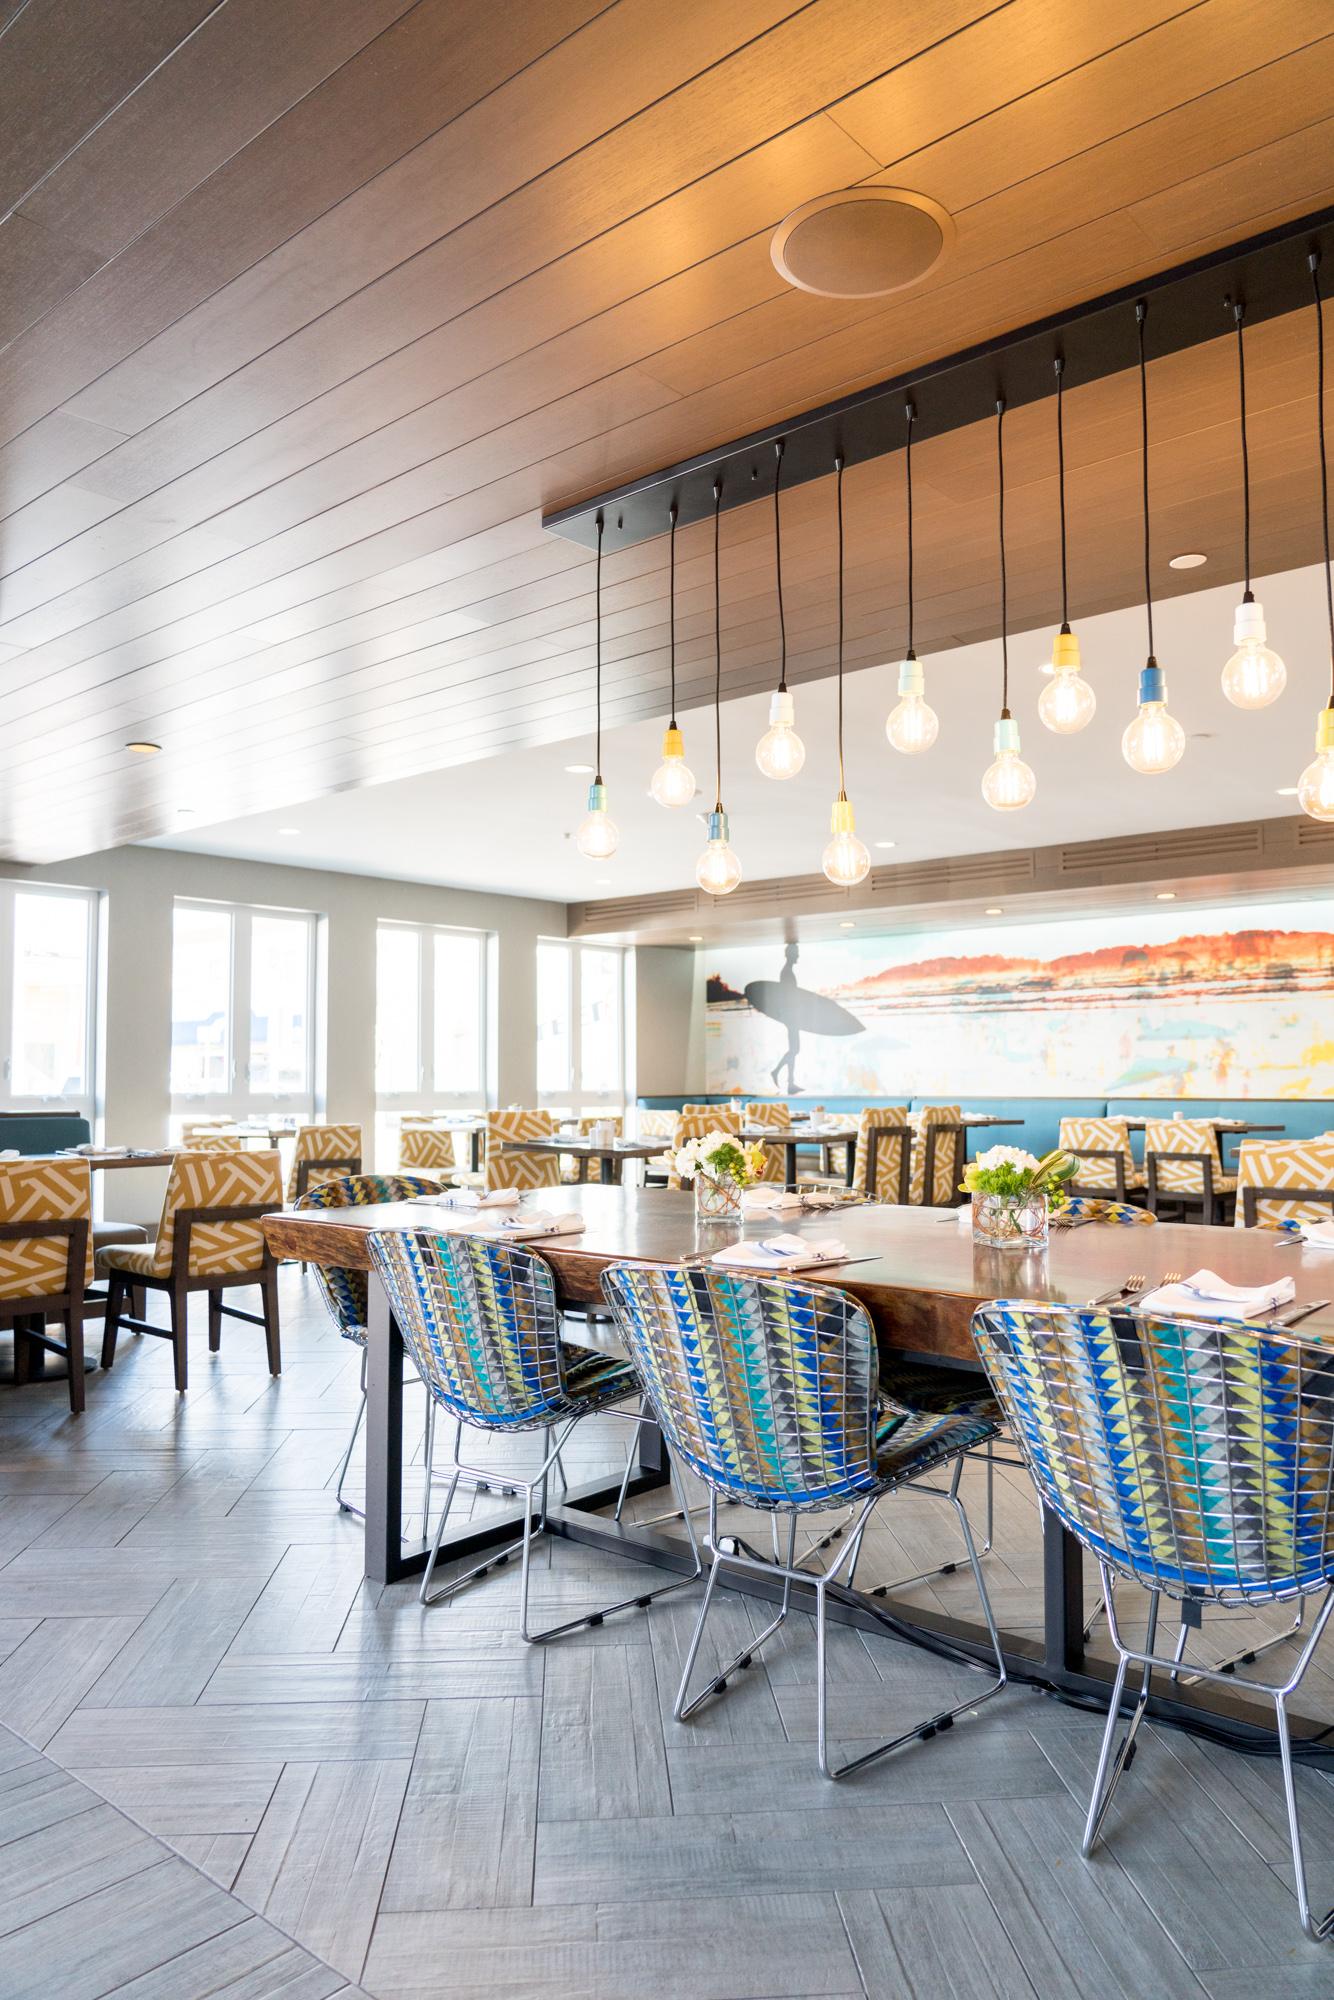 Blonde Restaurant at The Lobby at Inn at the Pier, Pismo Beach, CA